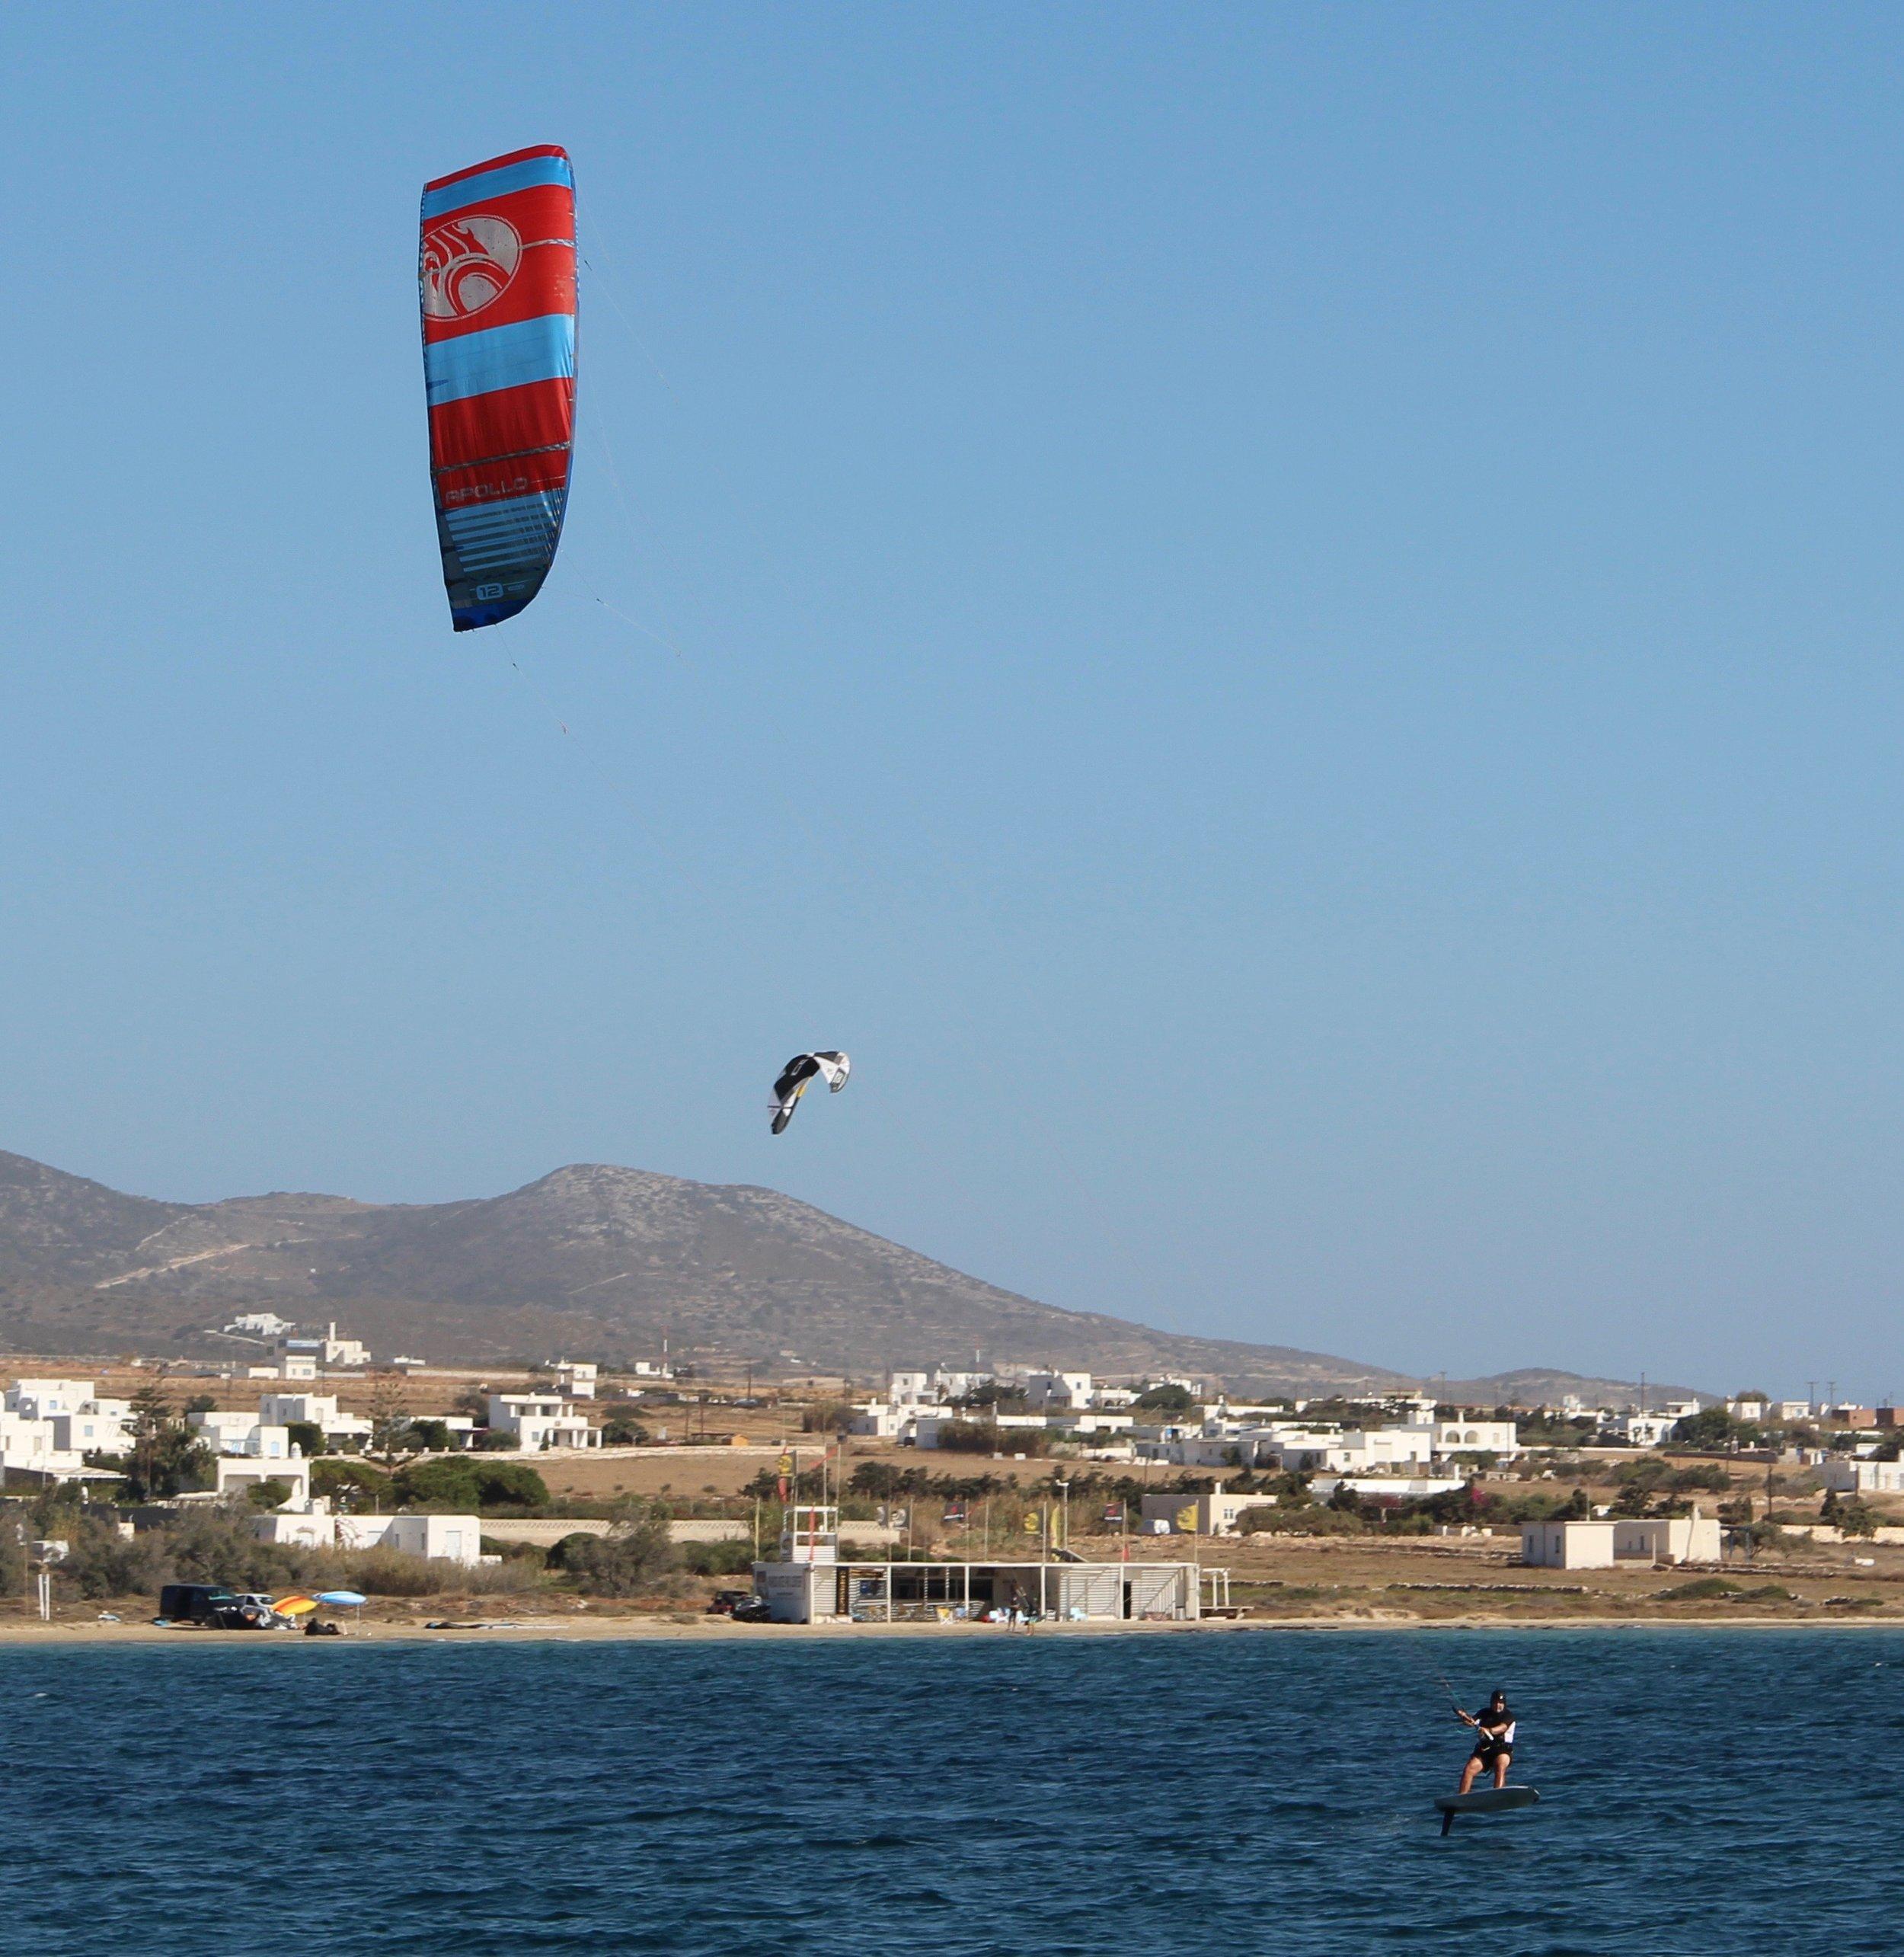 Bret kitesurfing in the channel between Paros and Antiparos